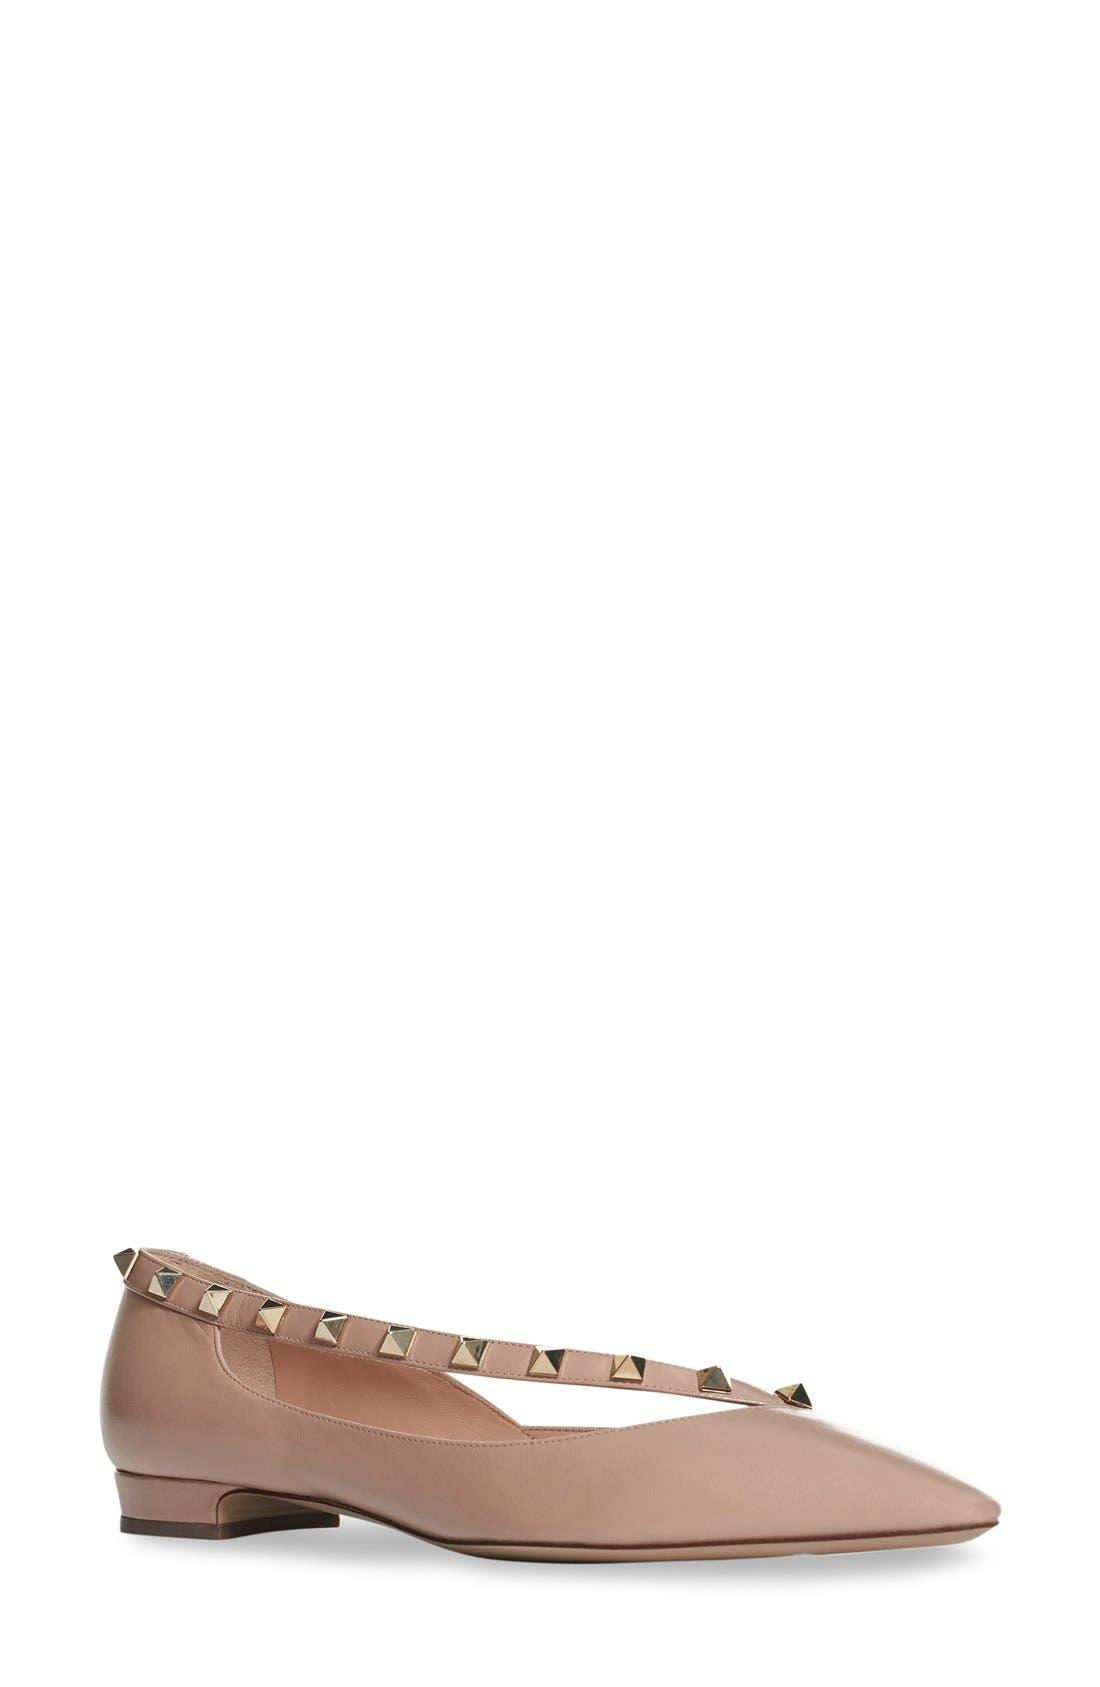 'Rockstud' Demi d'Orsay Flat,                         Main,                         color, Nude Leather